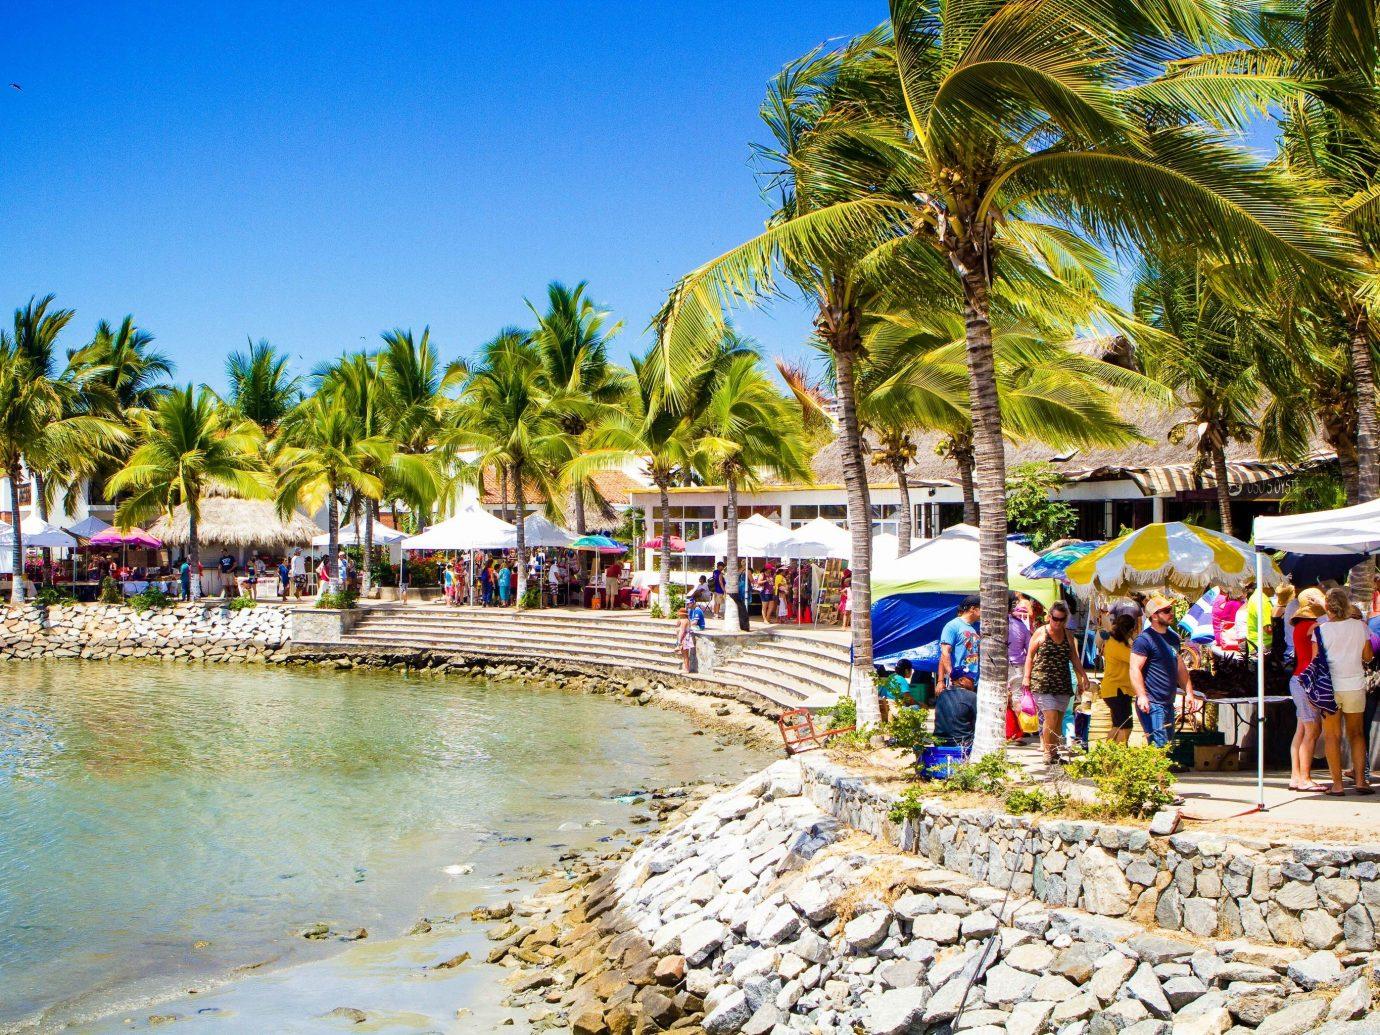 Food + Drink Mexico Puerto Vallarta body of water Beach Resort leisure tourism tree palm tree caribbean arecales water sky vacation tropics Coast shore recreation Sea plant Ocean bay